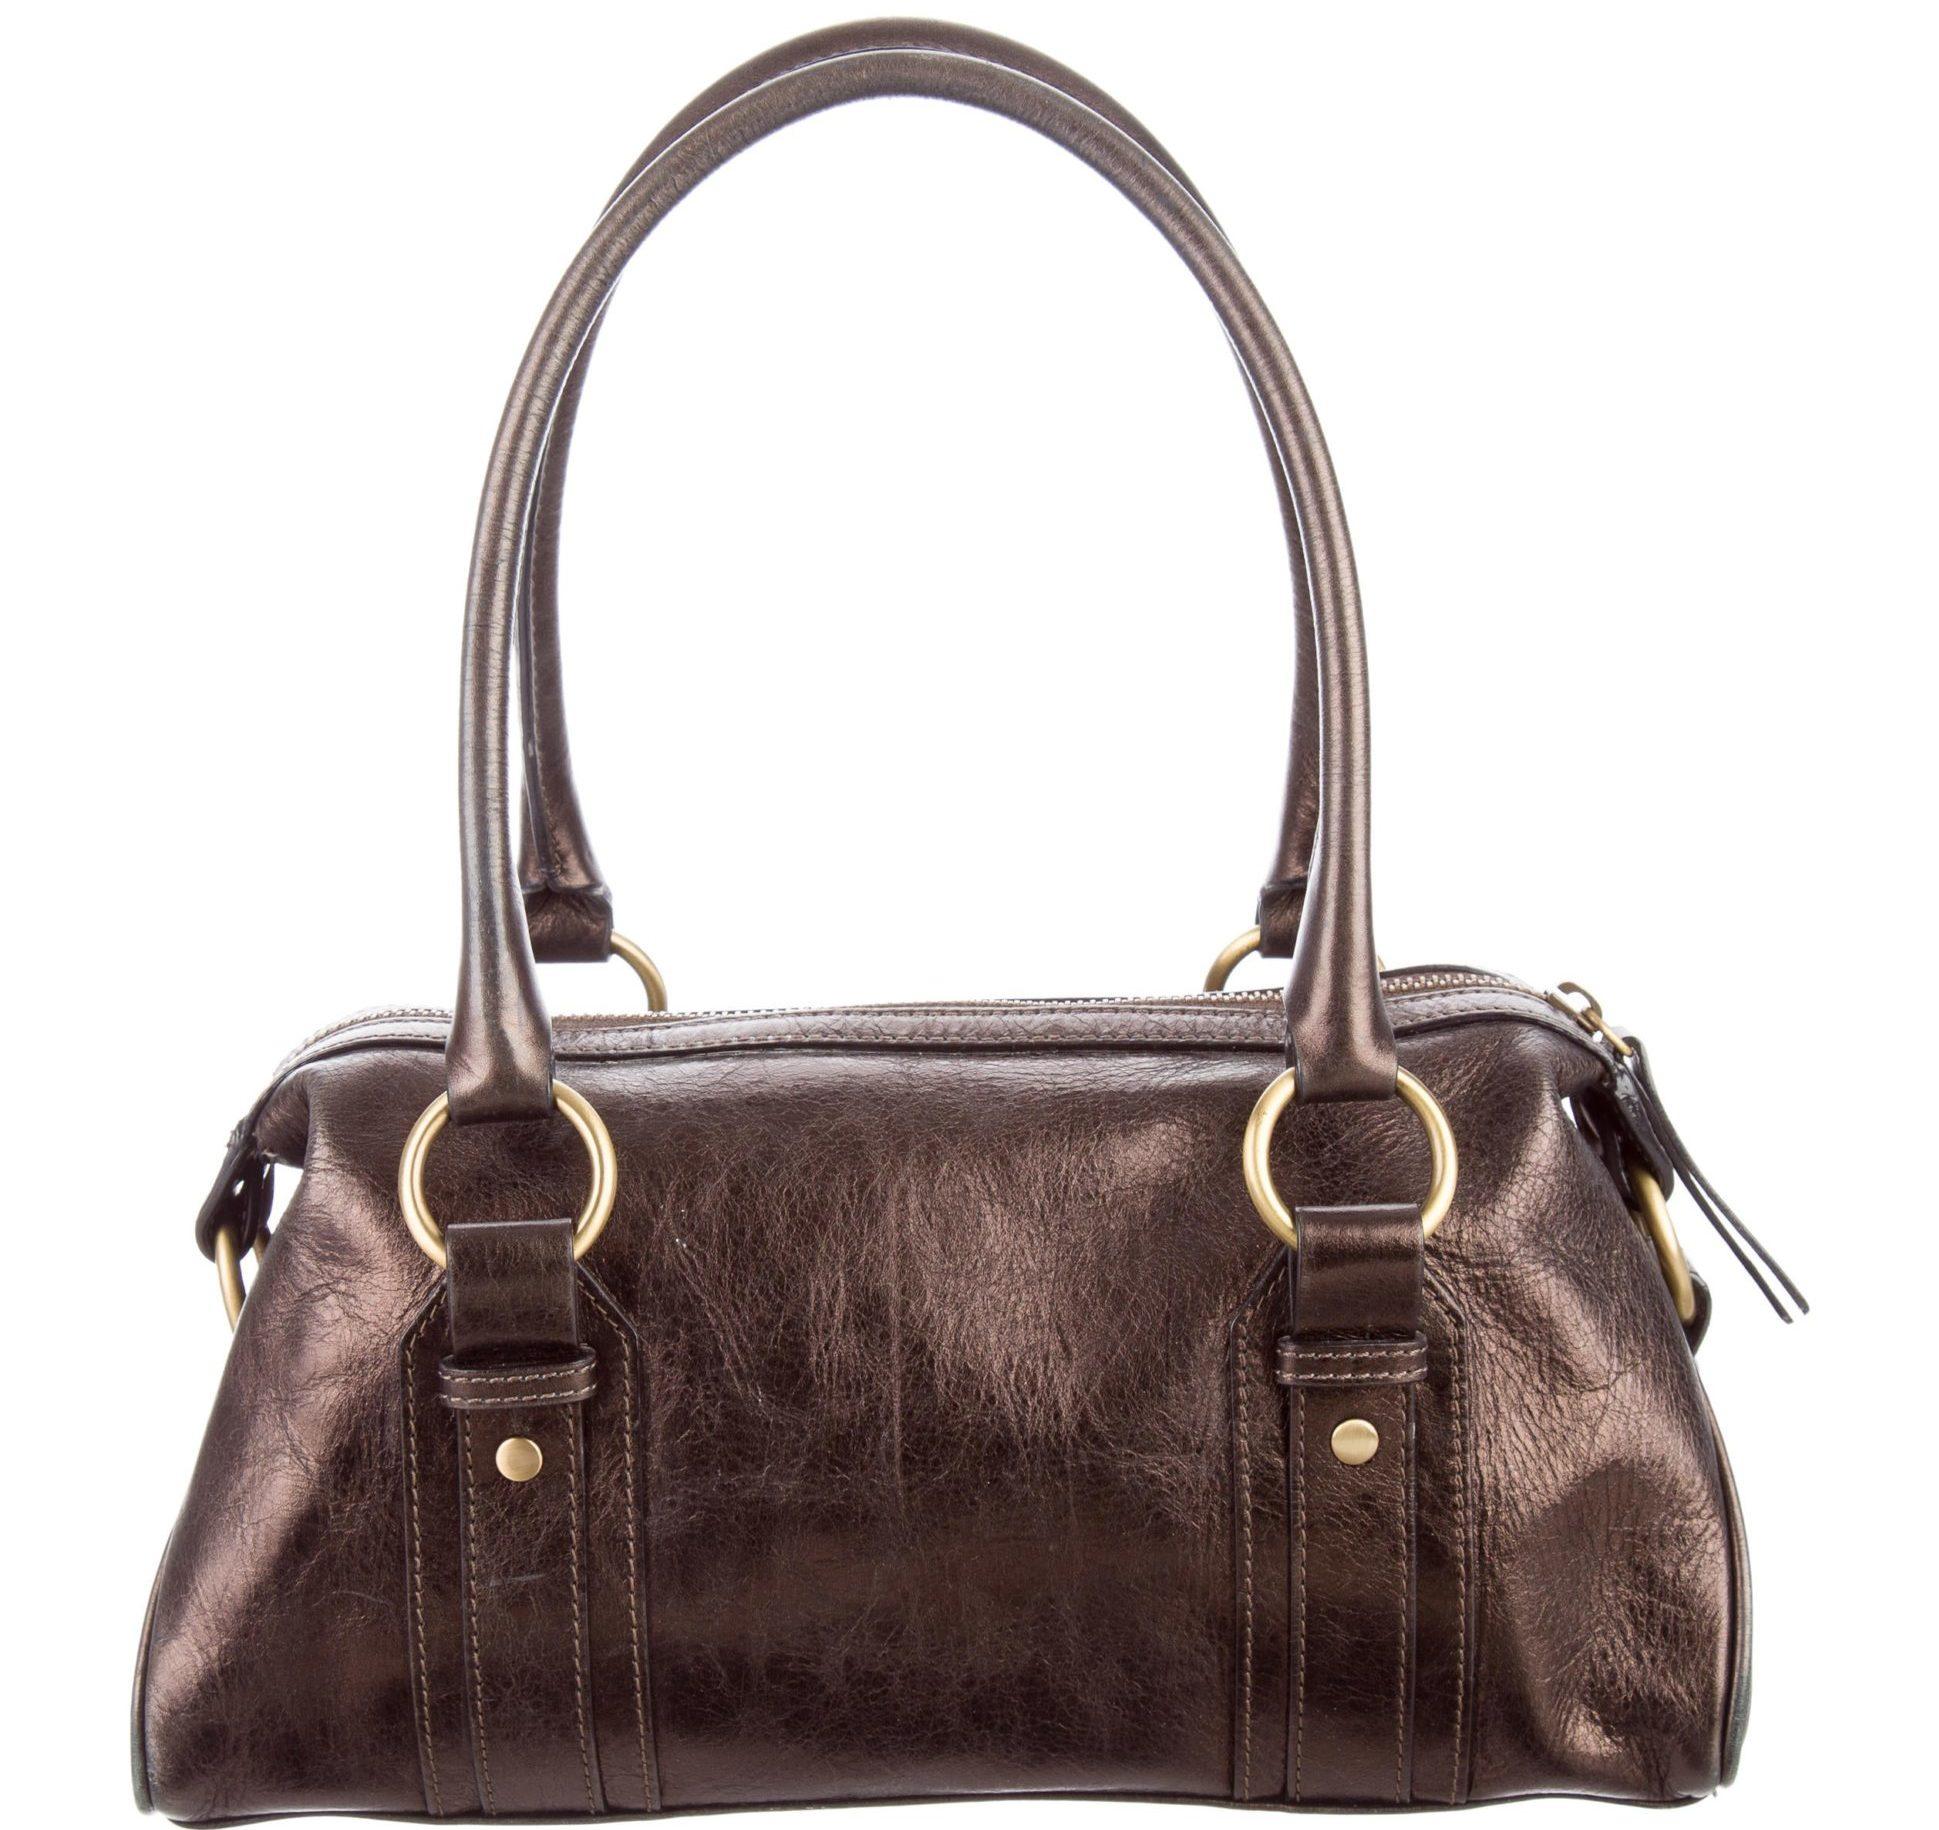 Prada Vitello Fall Women's Designer Leather Handbags: The Newest Collection